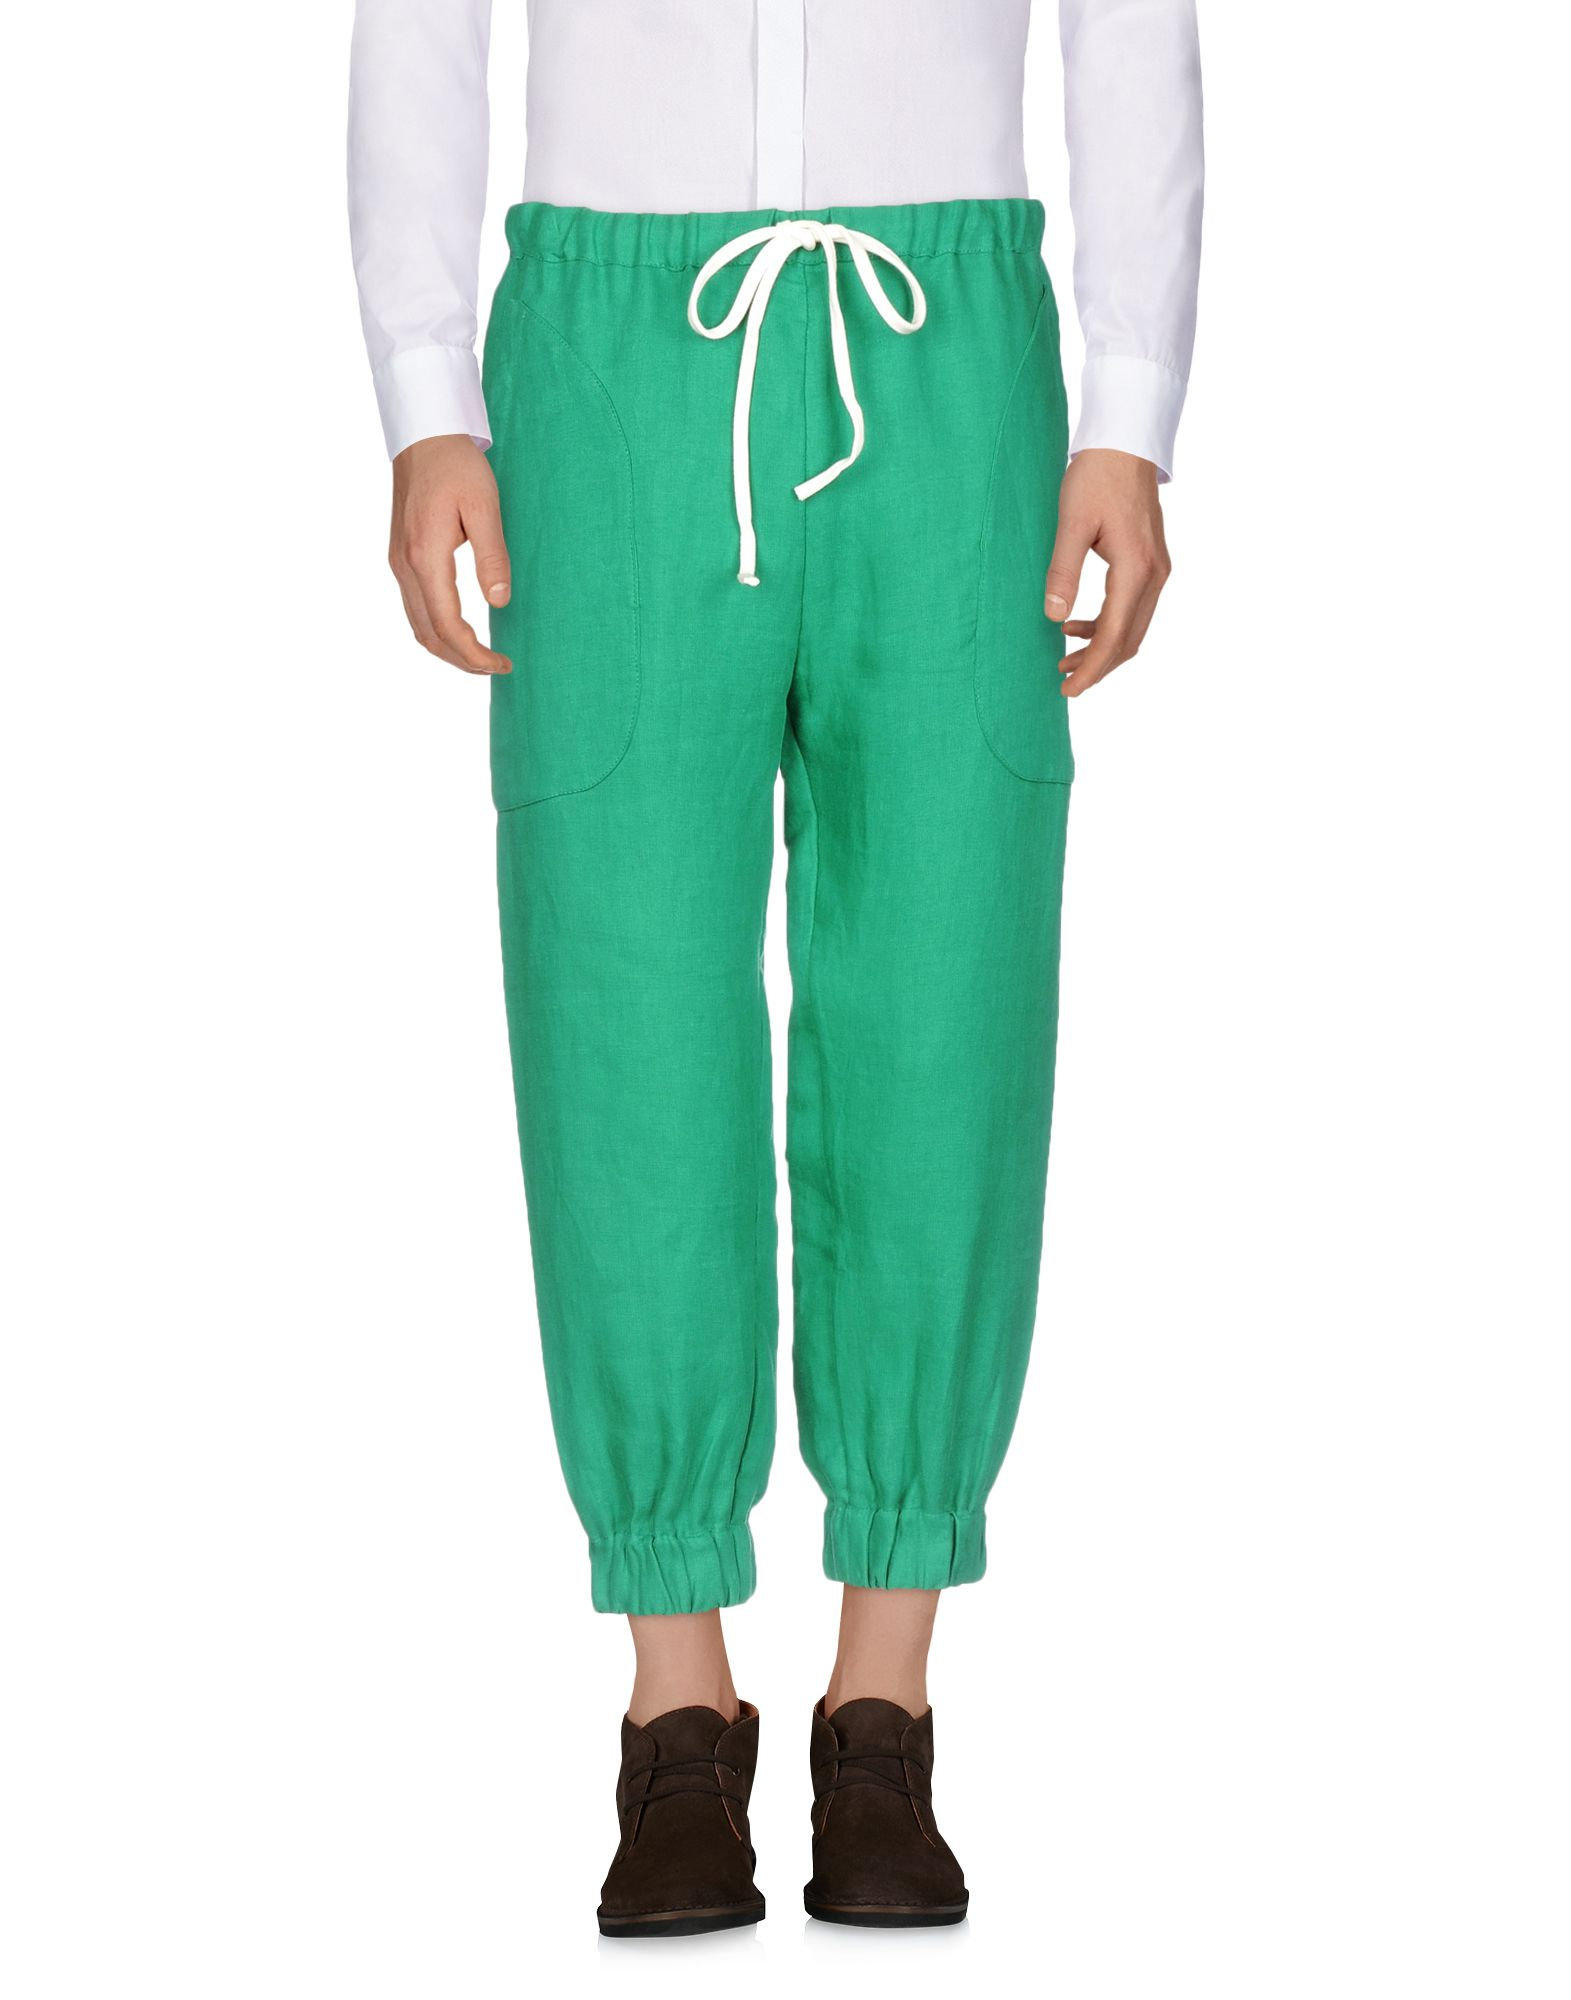 DIMA LEU Casual Pants in Green